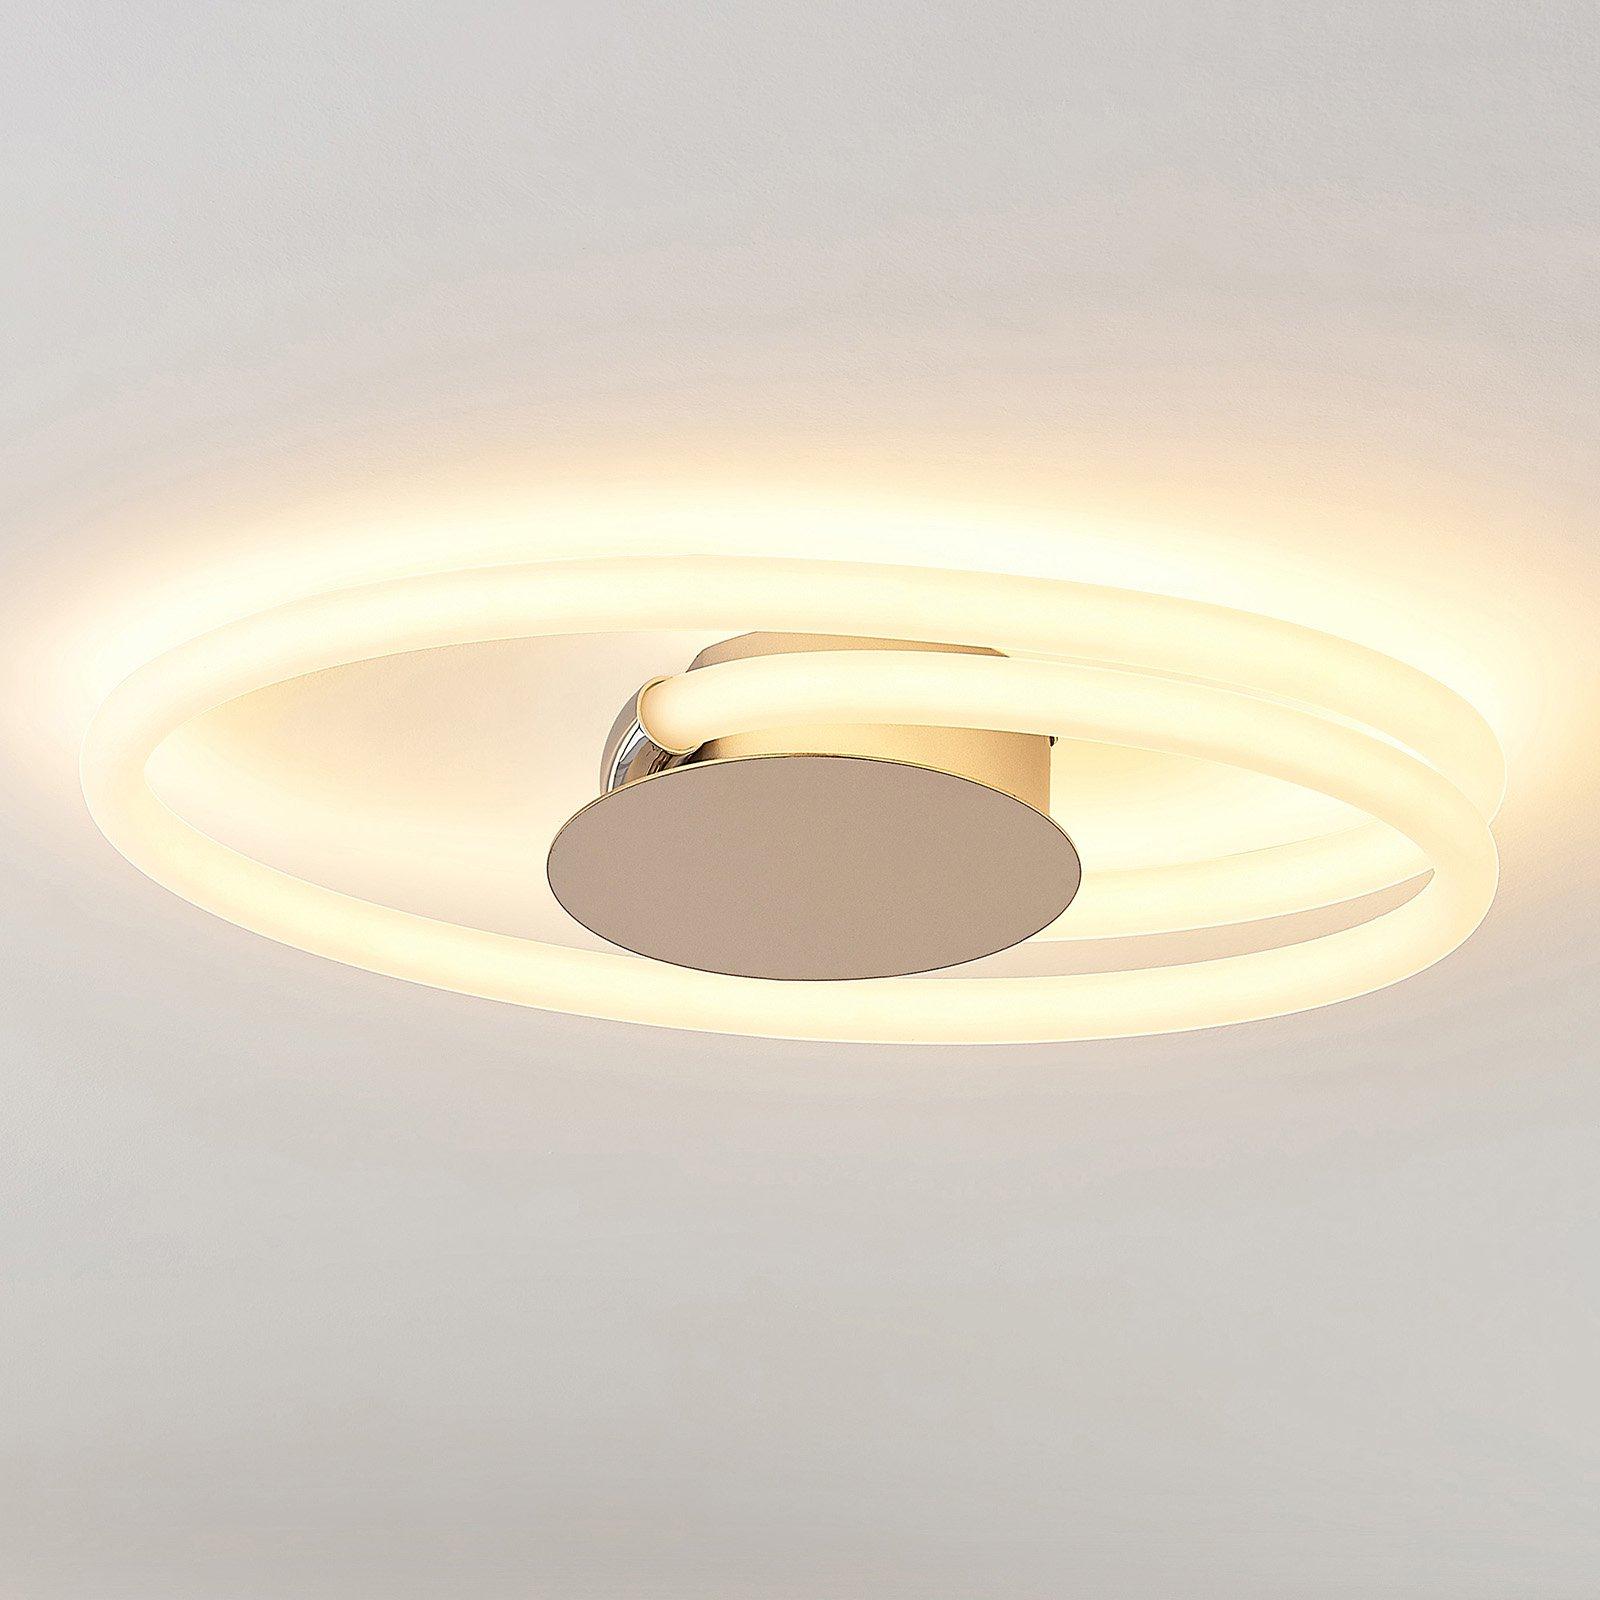 Lucande Ovala LED-taklampe, 53 cm